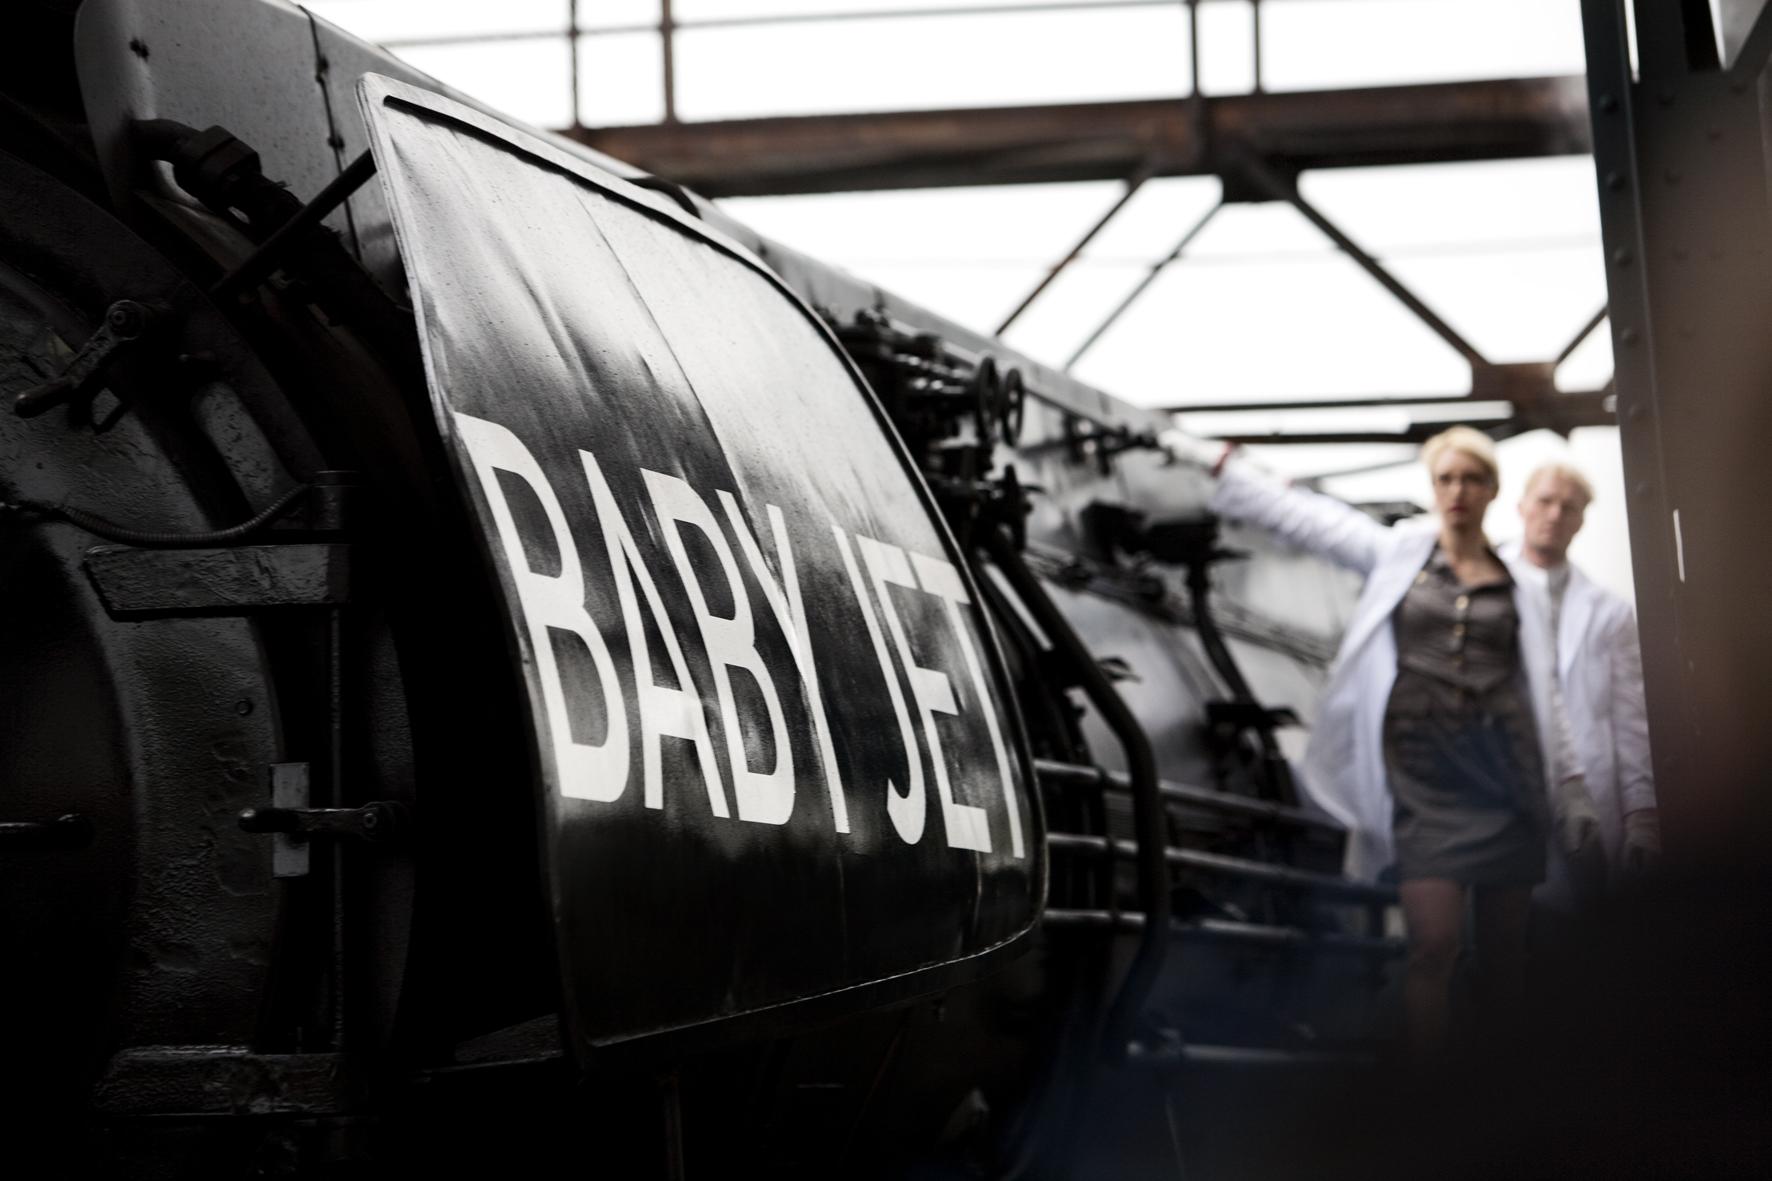 babyjet-8137.jpg